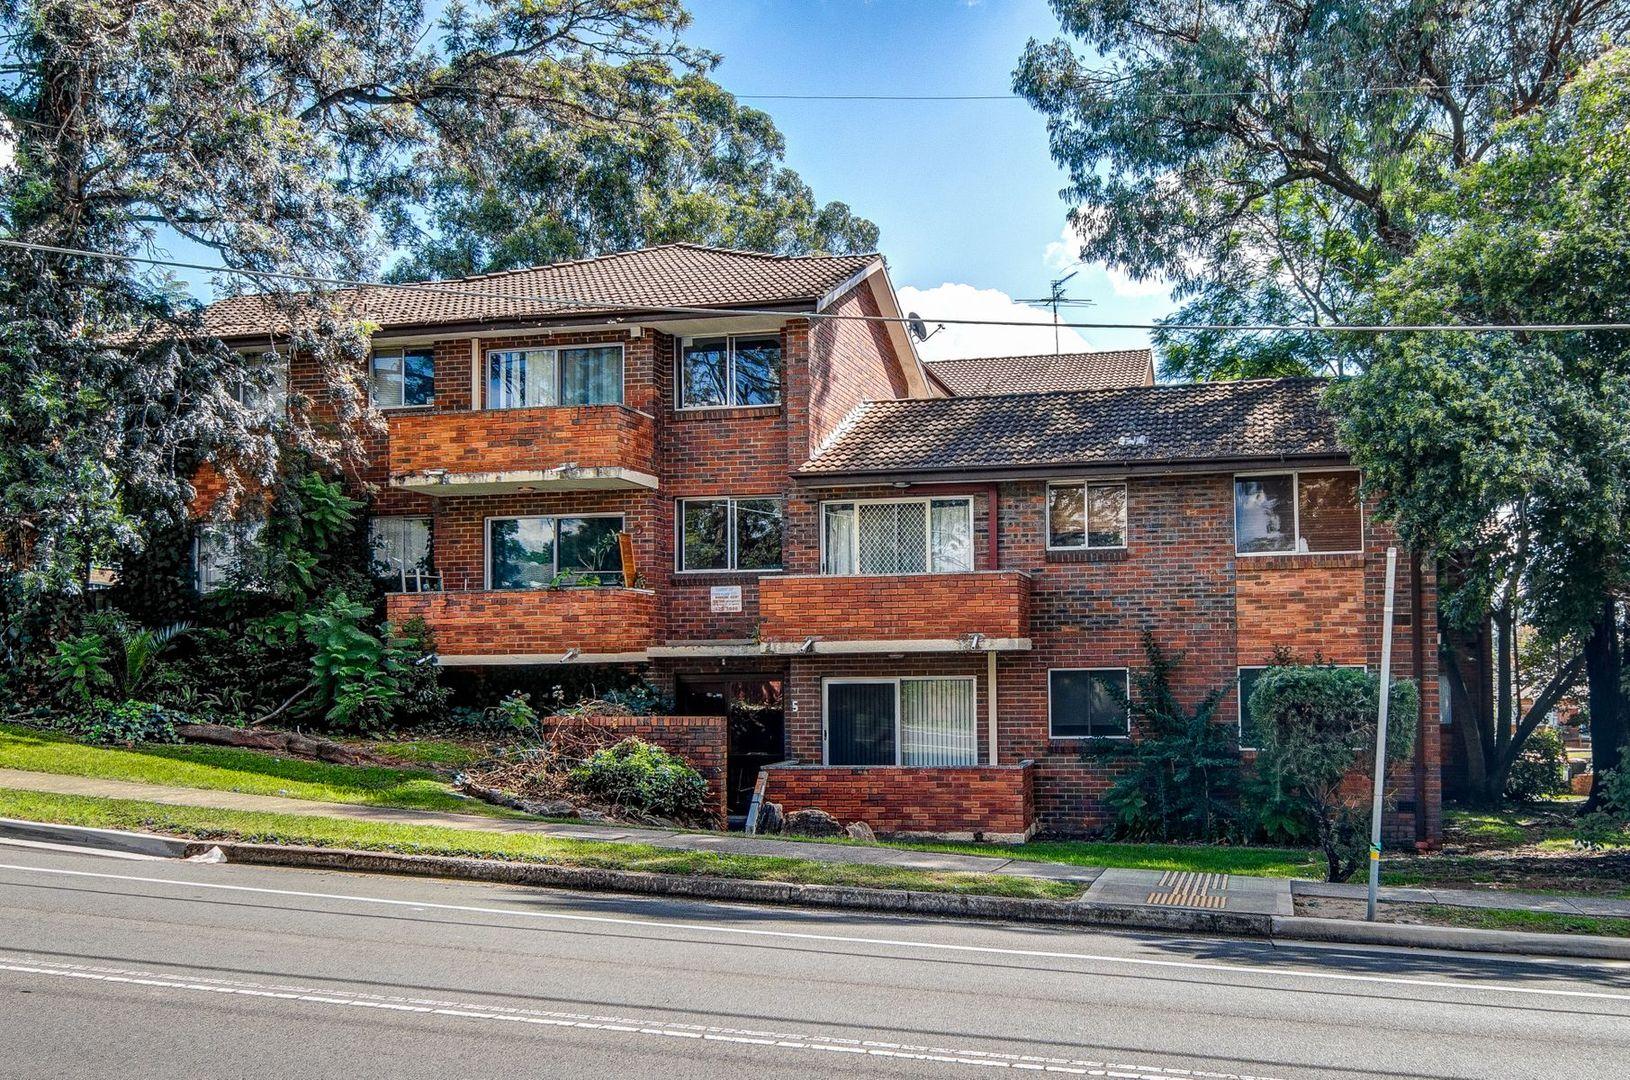 6/5 Lemongrove Road, Penrith NSW 2750, Image 0